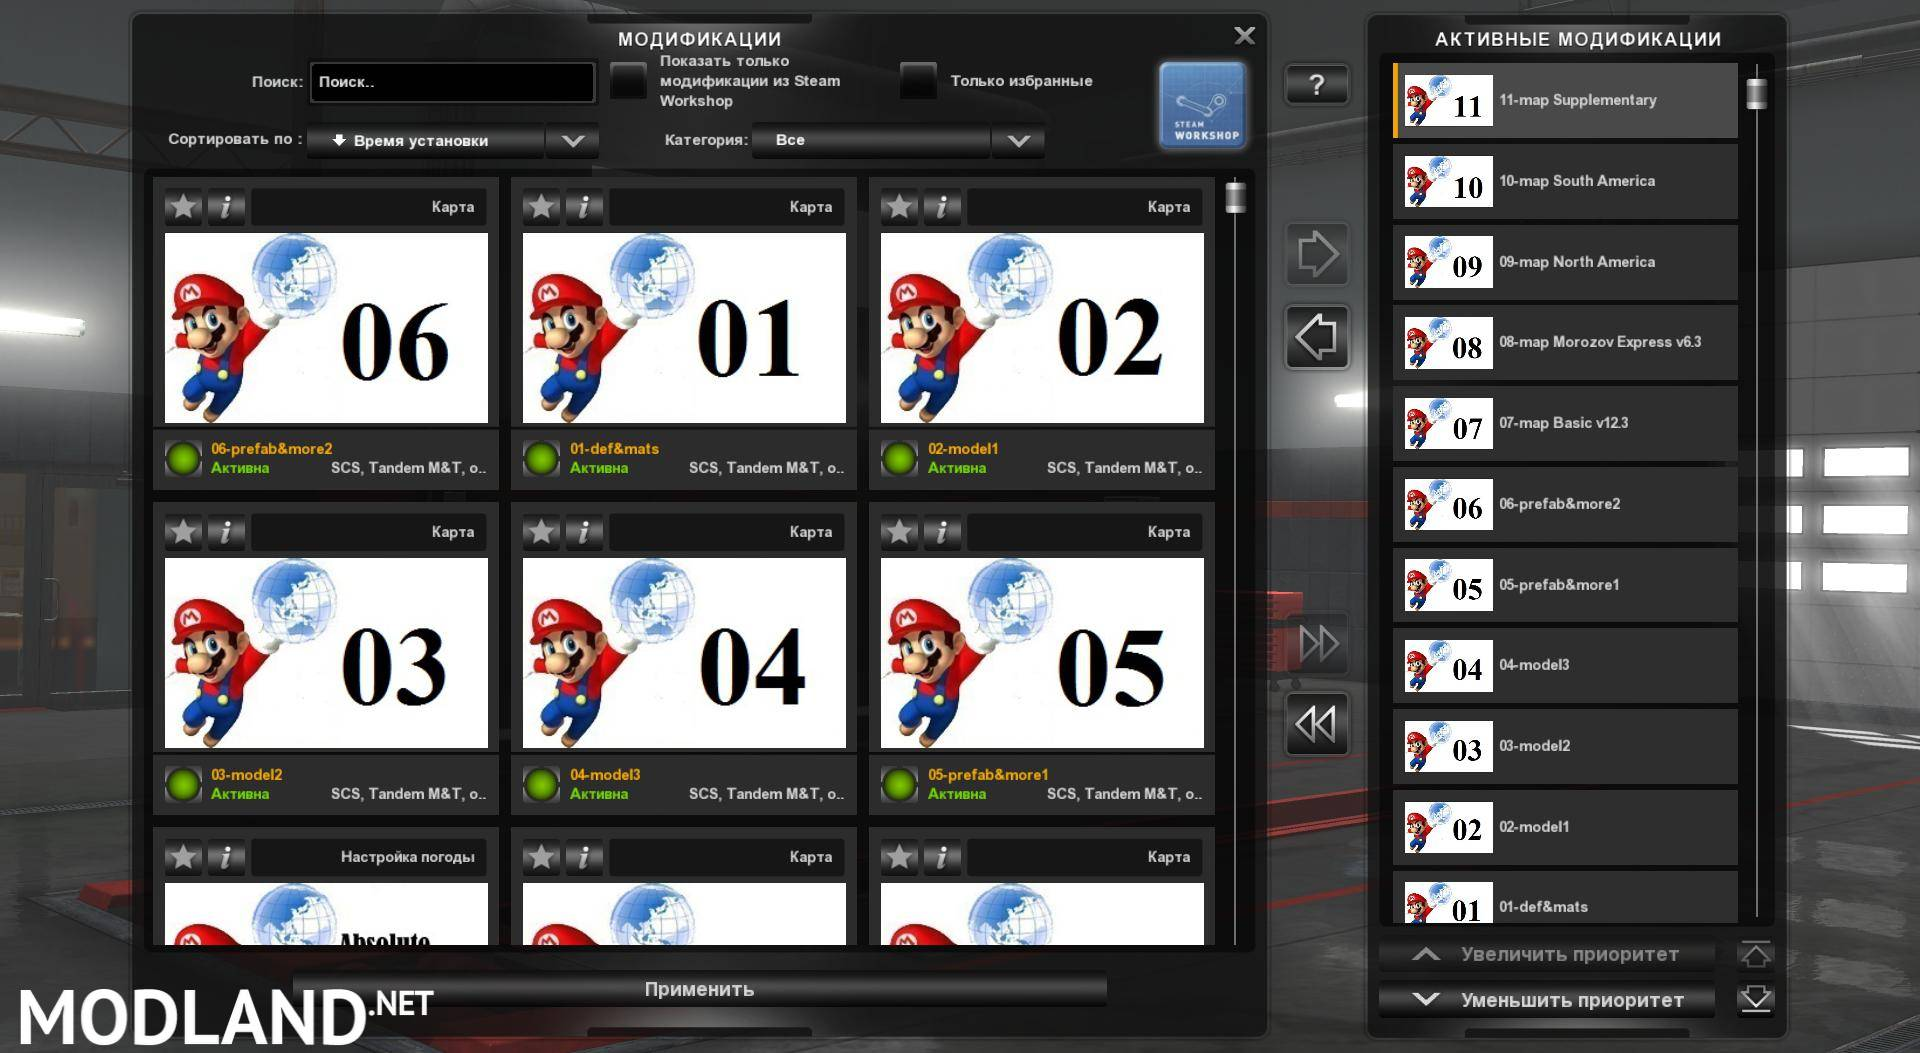 Mario map v123 128x mod for ets 2 mario map v123 128x 2 photo publicscrutiny Image collections